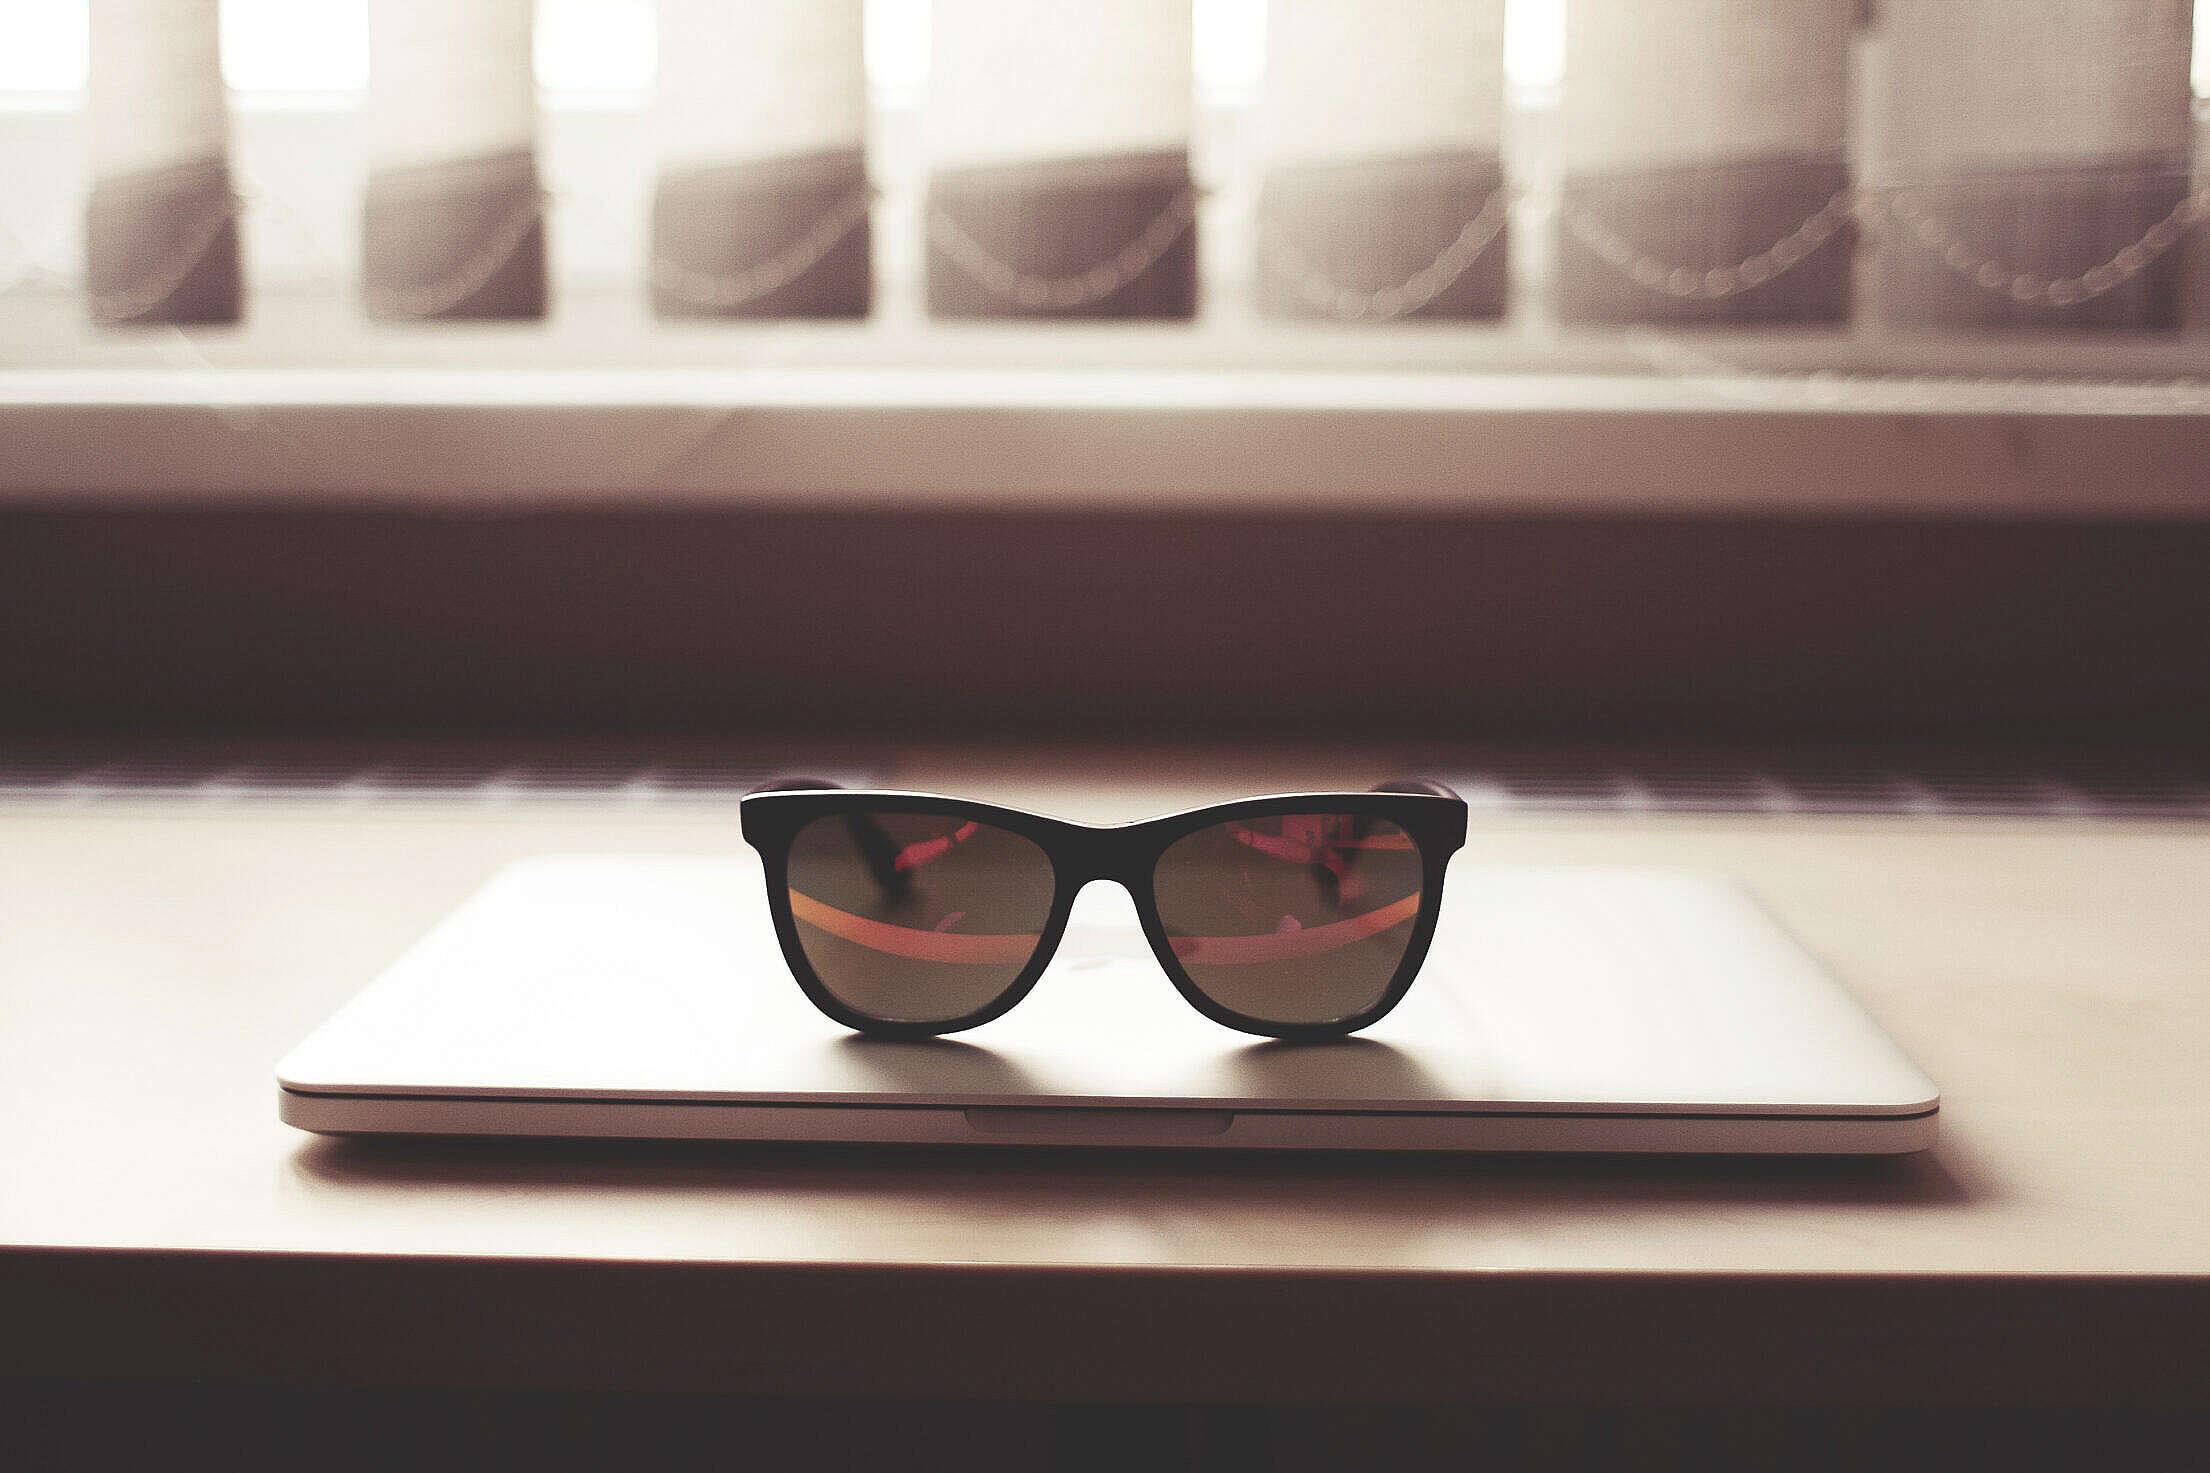 Fashion Glasses on MacBook Pro Free Stock Photo